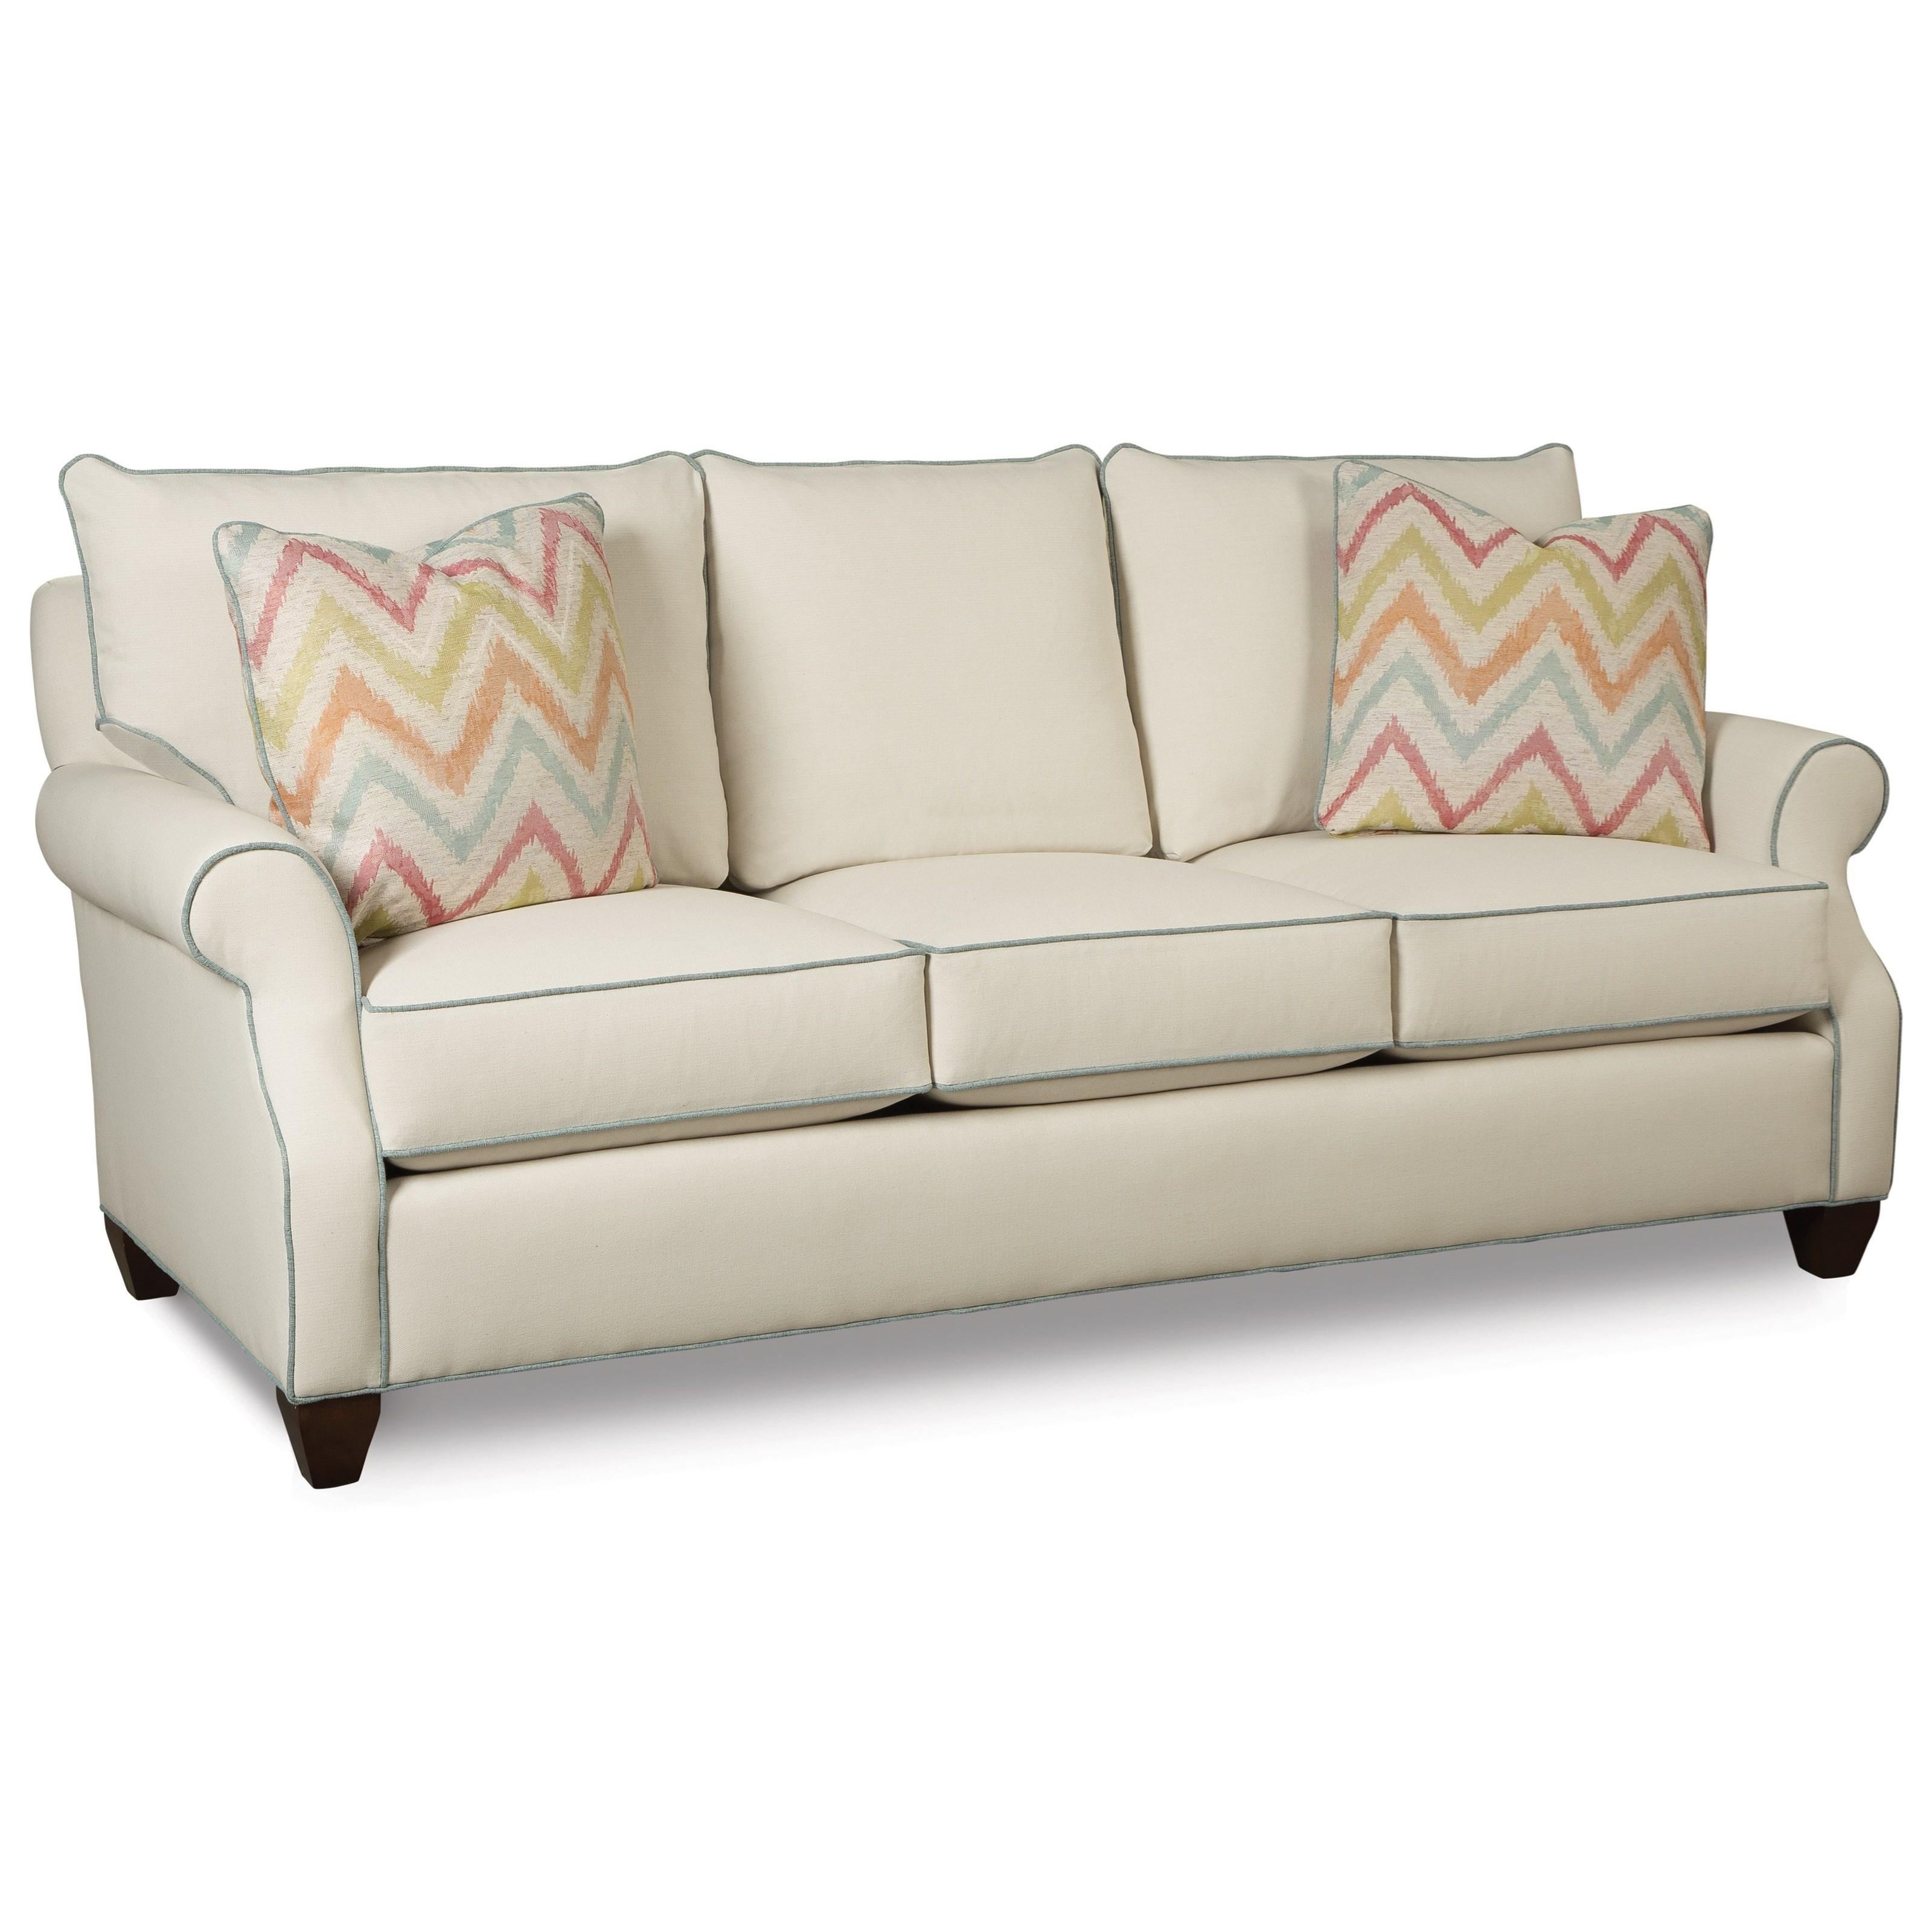 2051 Sofa by Geoffrey Alexander at Sprintz Furniture